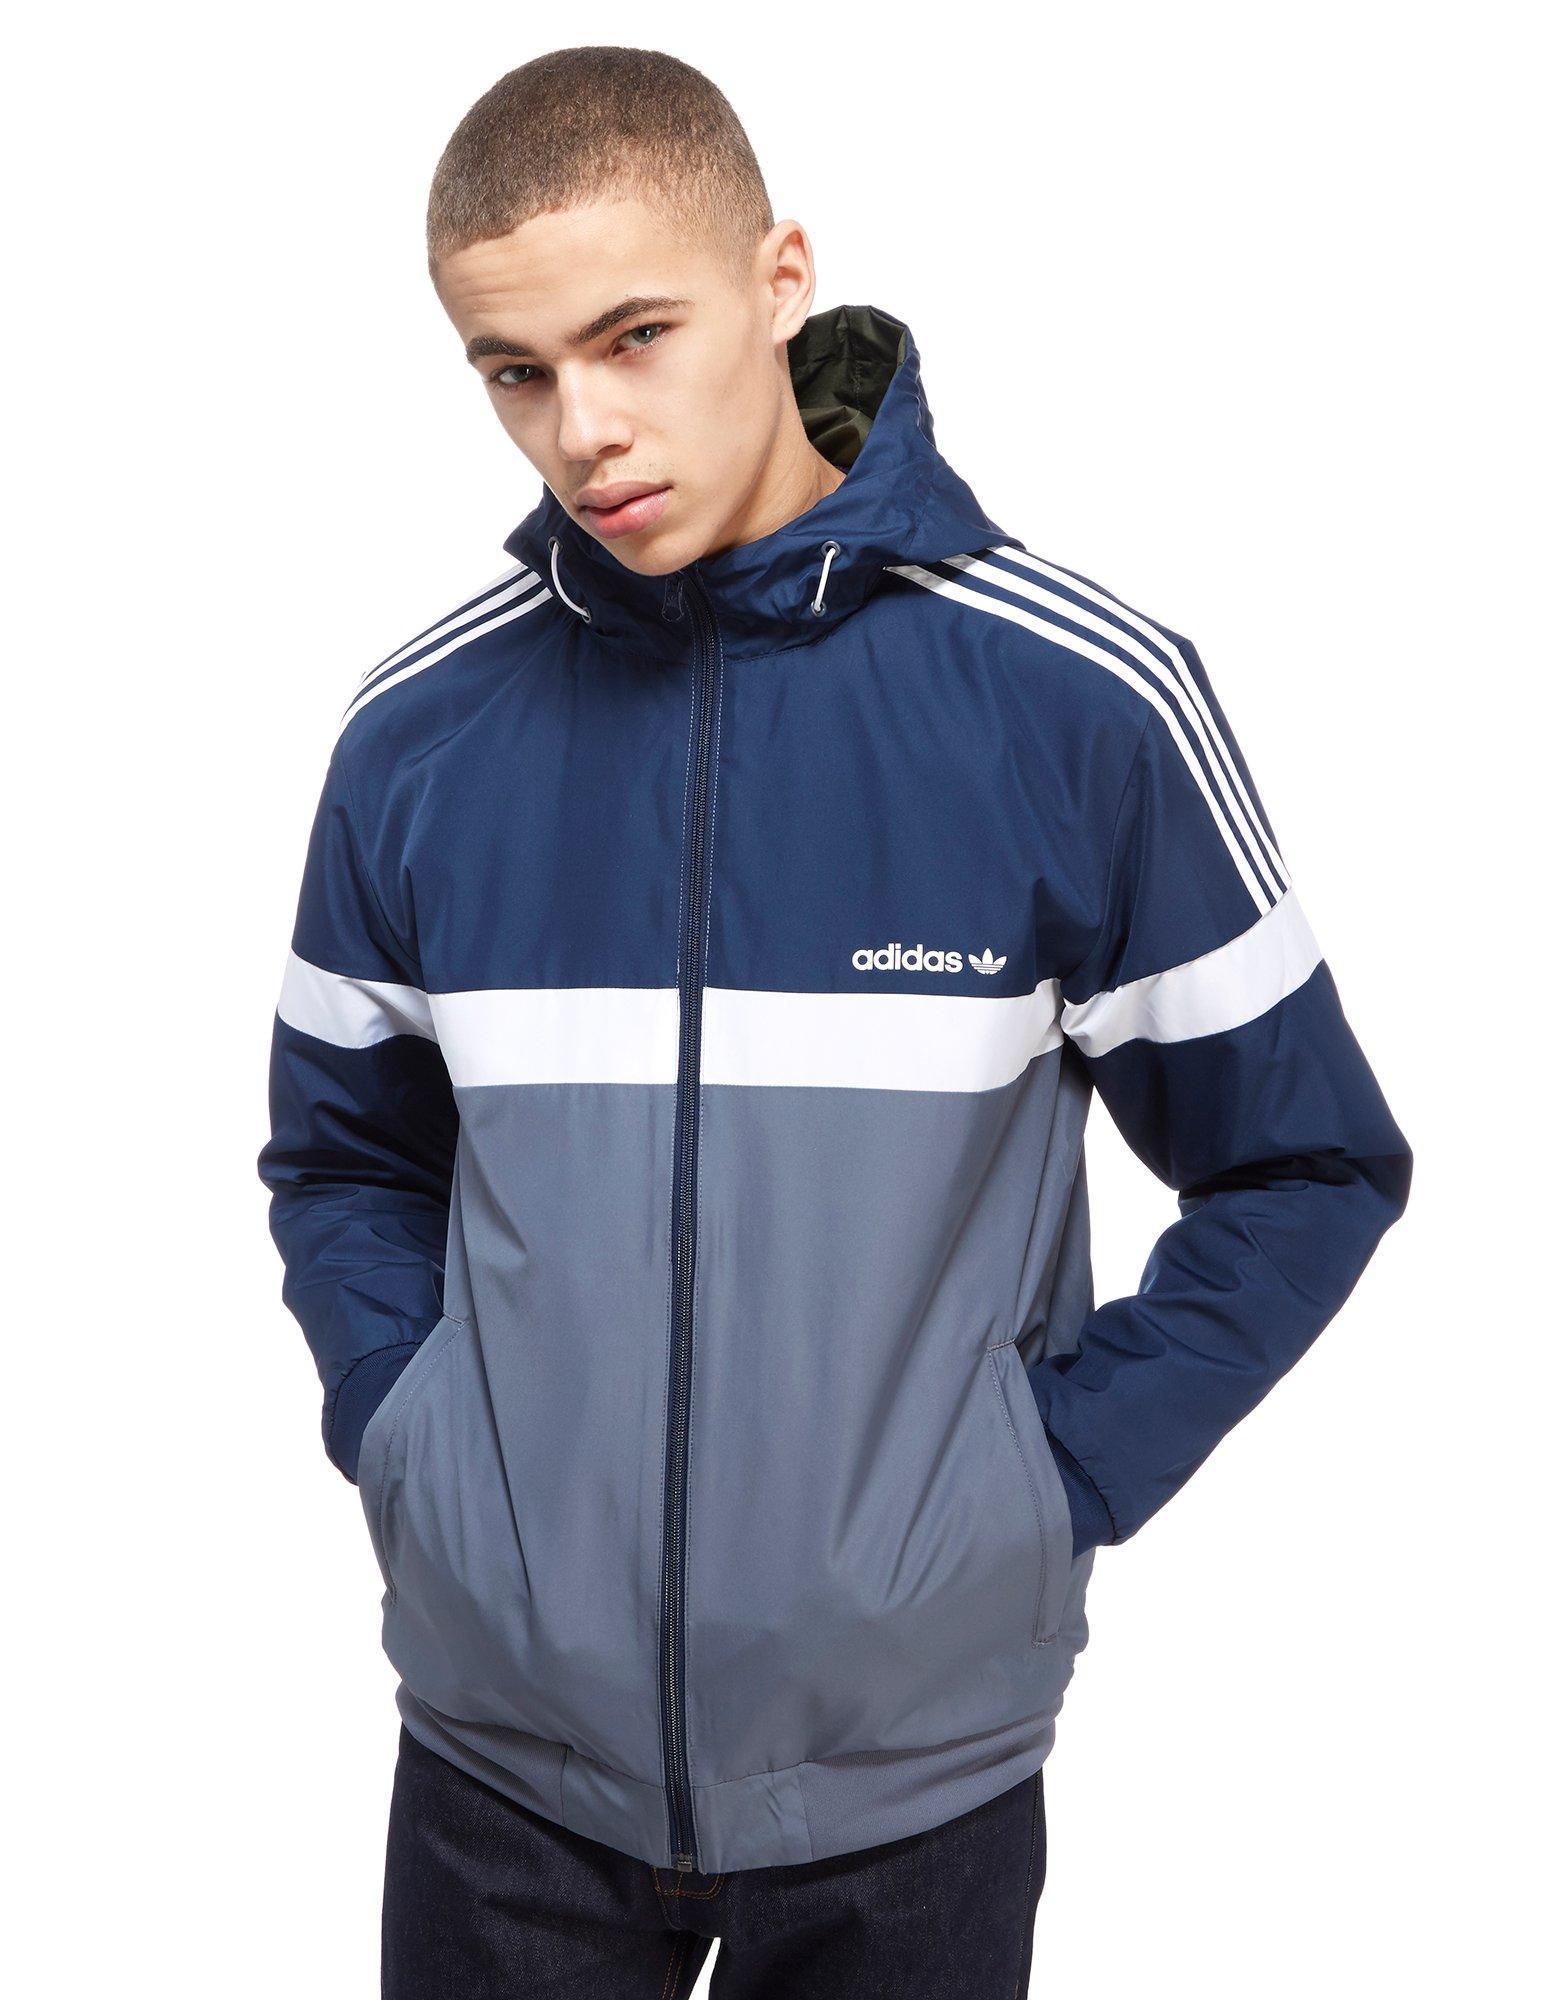 Adidas Originals Itasca Reversible Jacket In Blue For Men